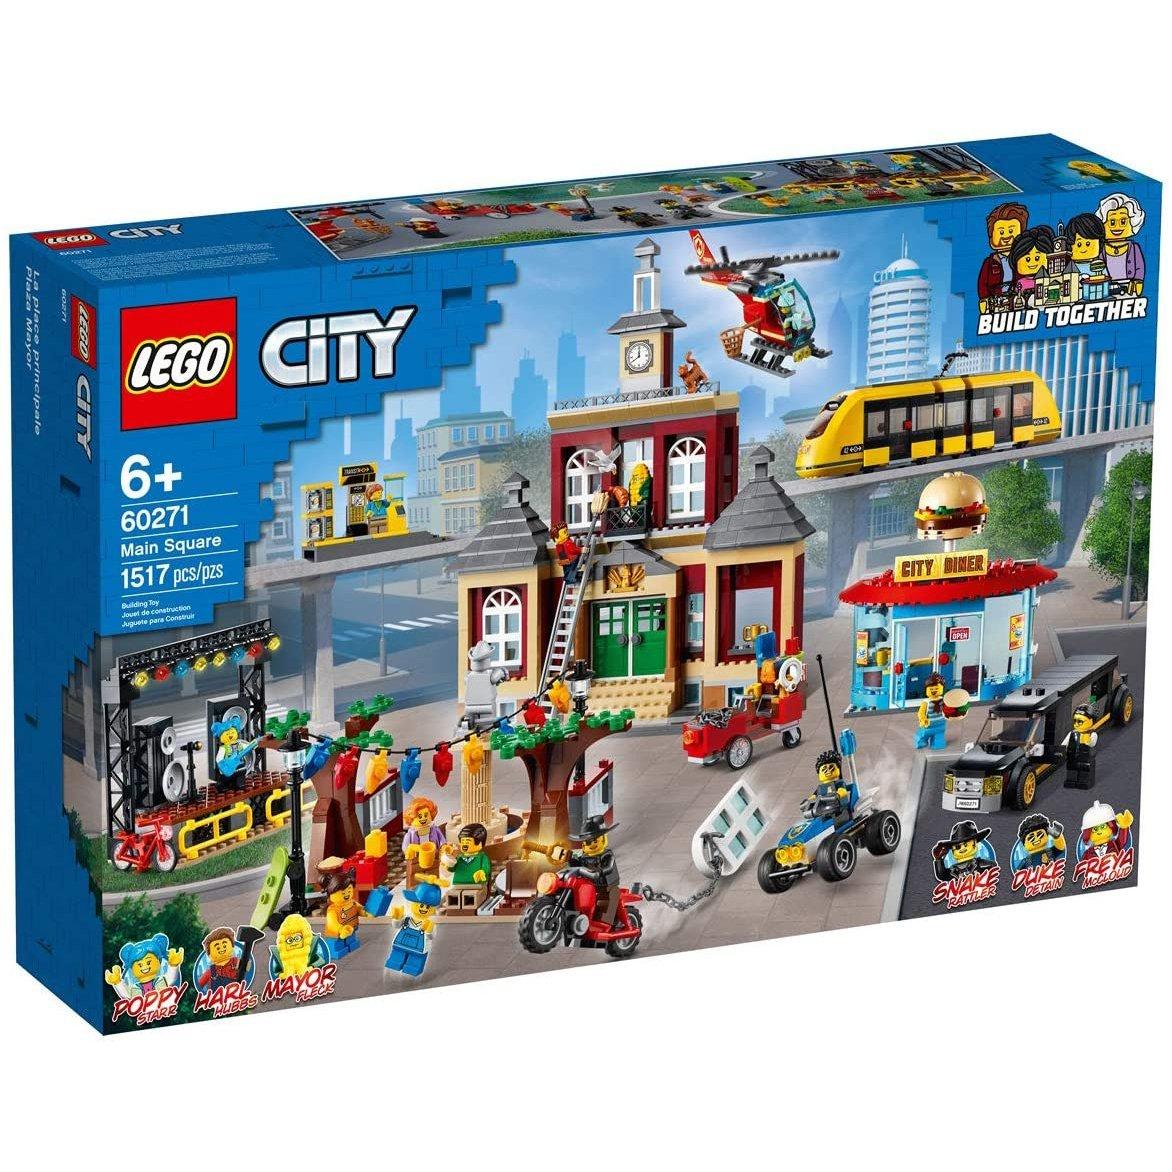 LEGO 樂高積木 City LT60271 主廣場